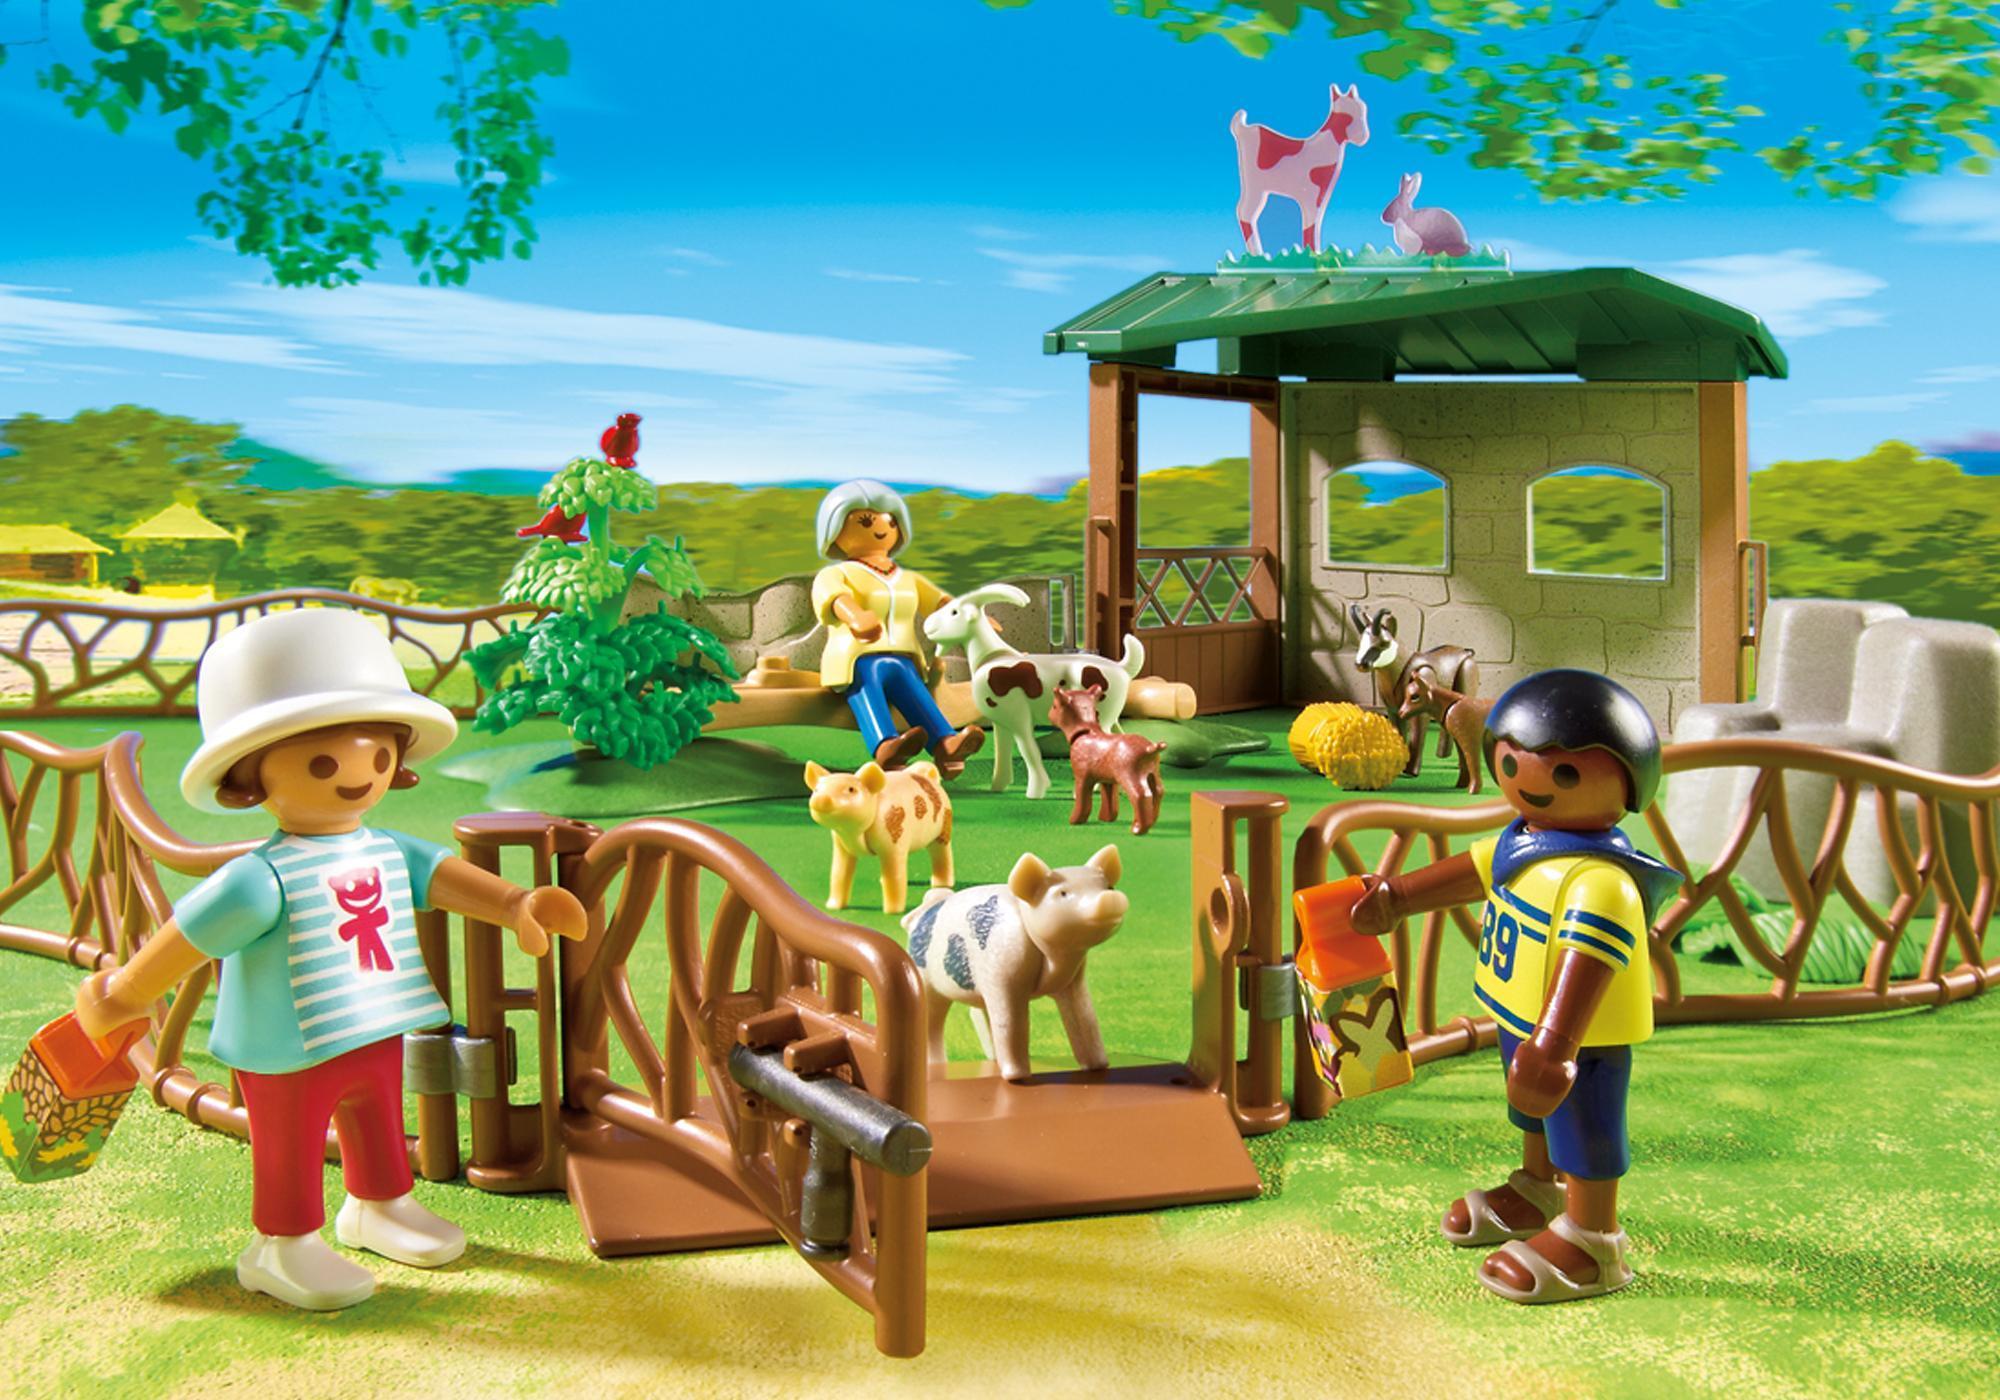 http://media.playmobil.com/i/playmobil/6635_product_extra1